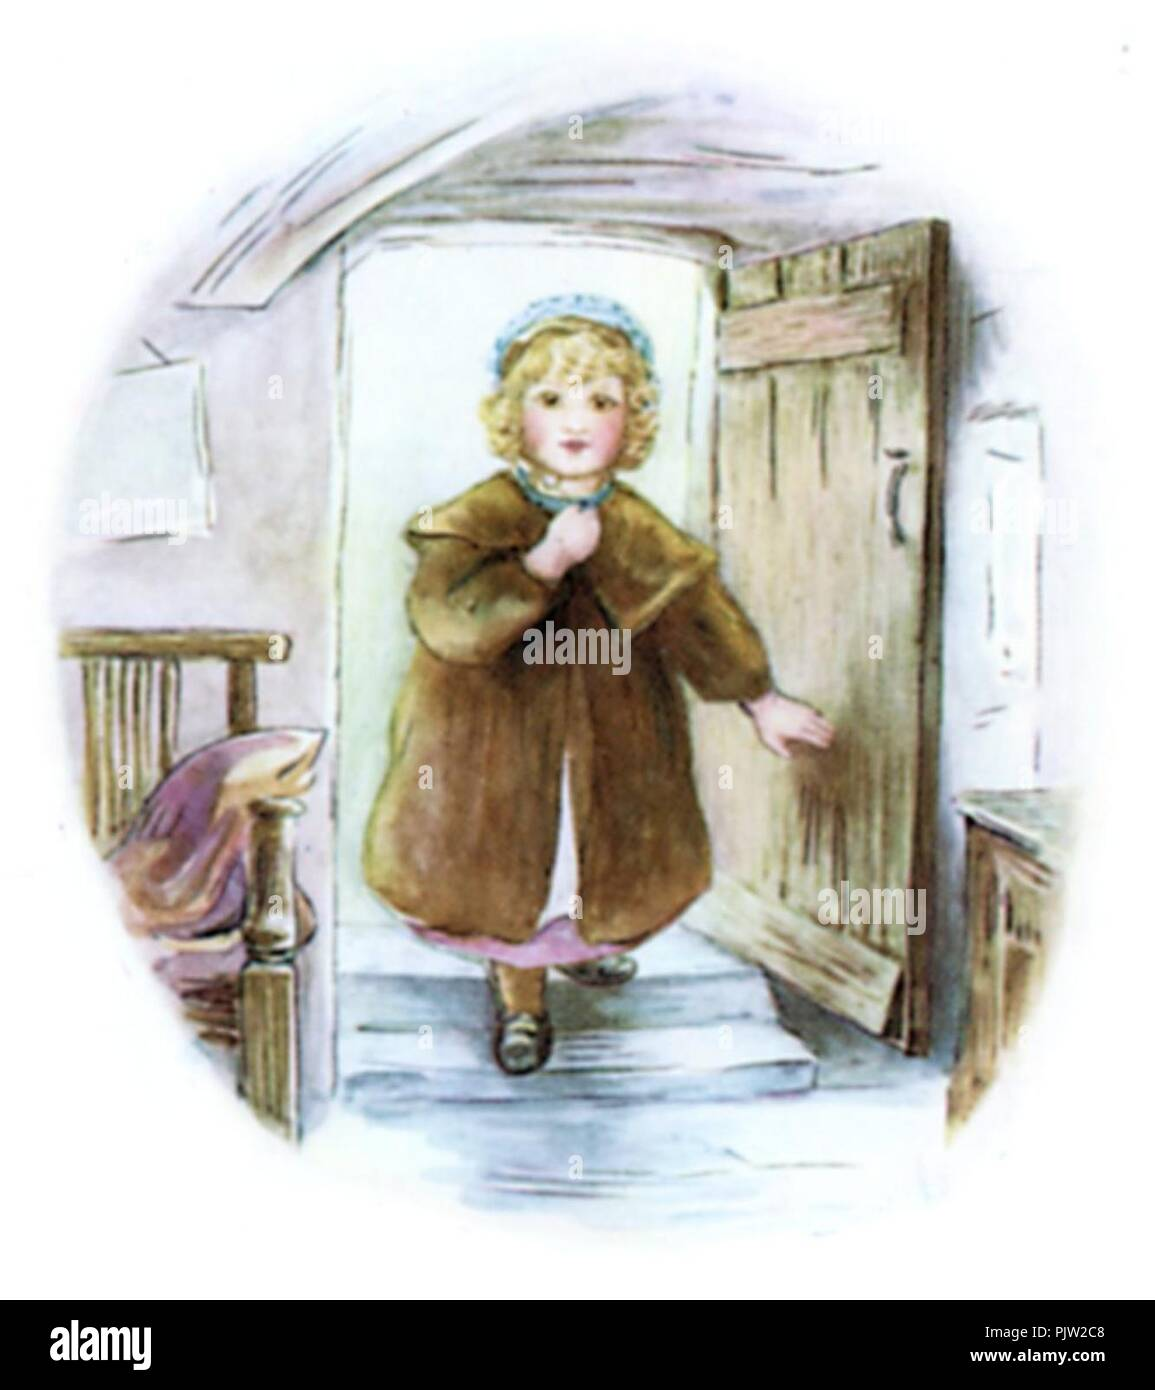 Beatrix Potter, Mrs Tiggy-Winkle, Lucie enters. - Stock Image